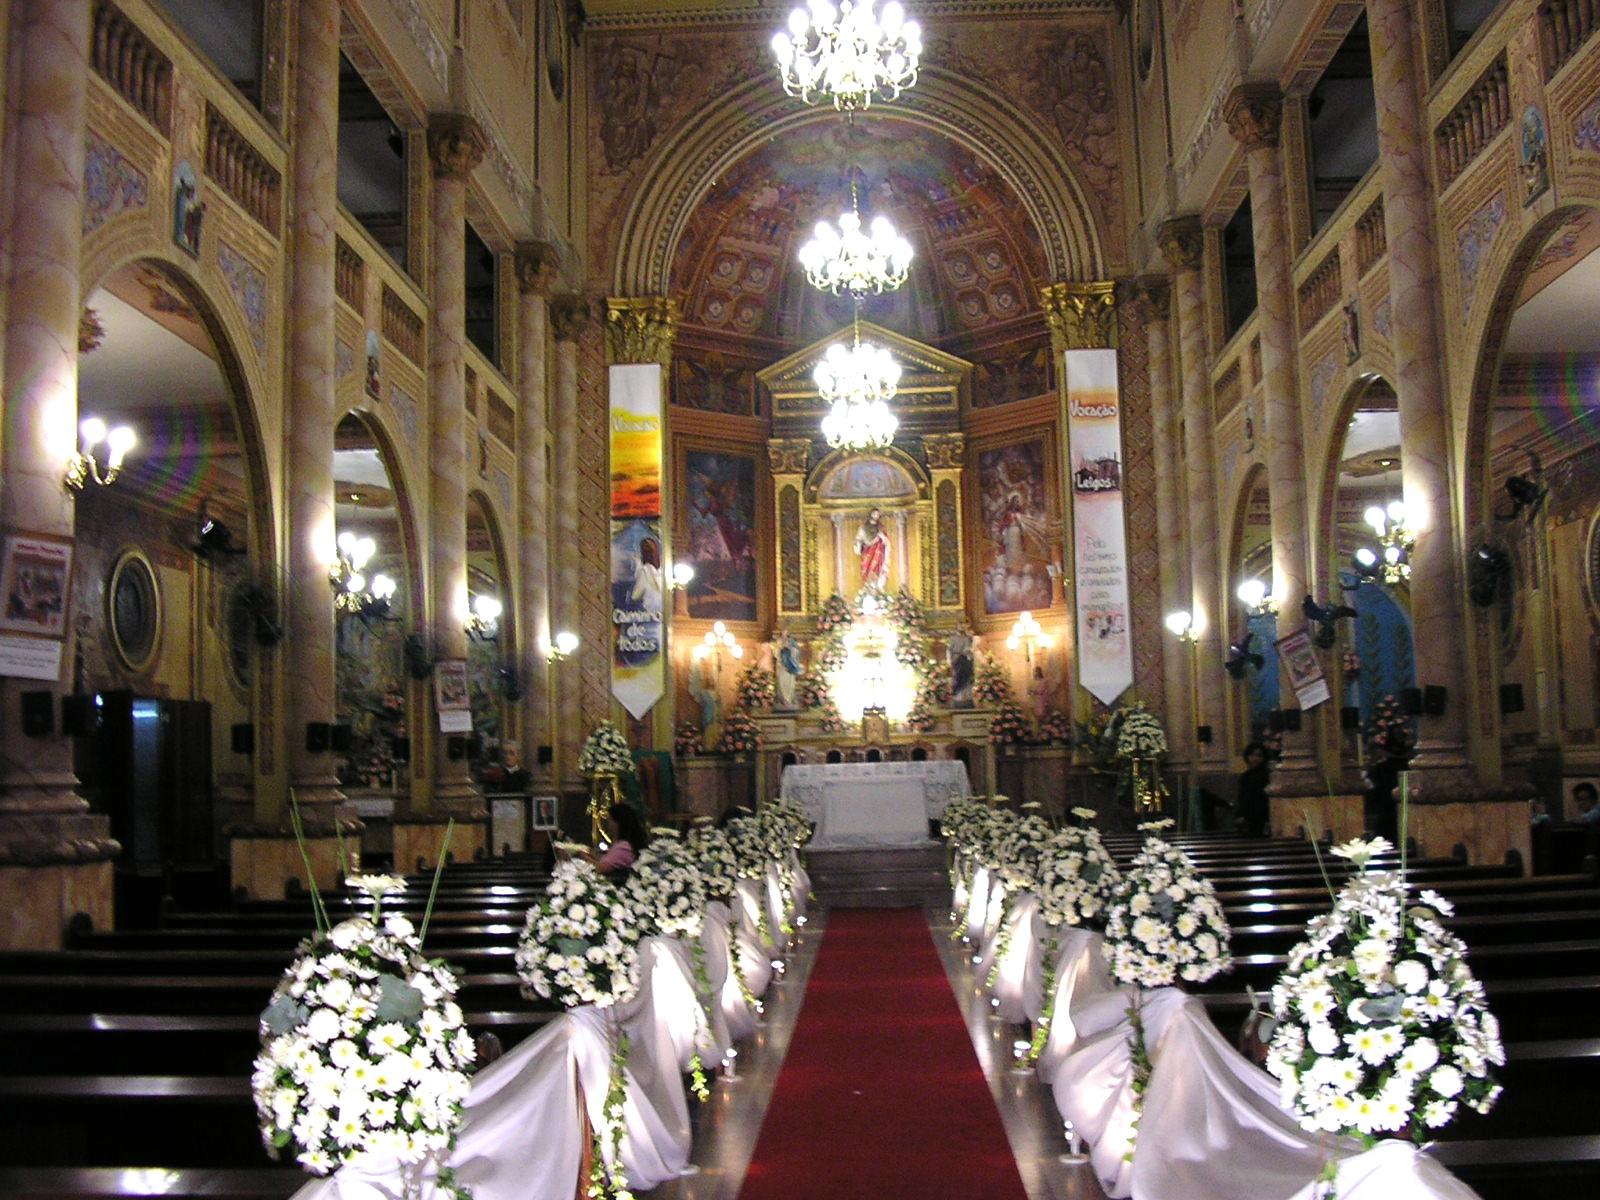 Matrimonio Igreja Catolica : Enfim noiva ★ processo religioso